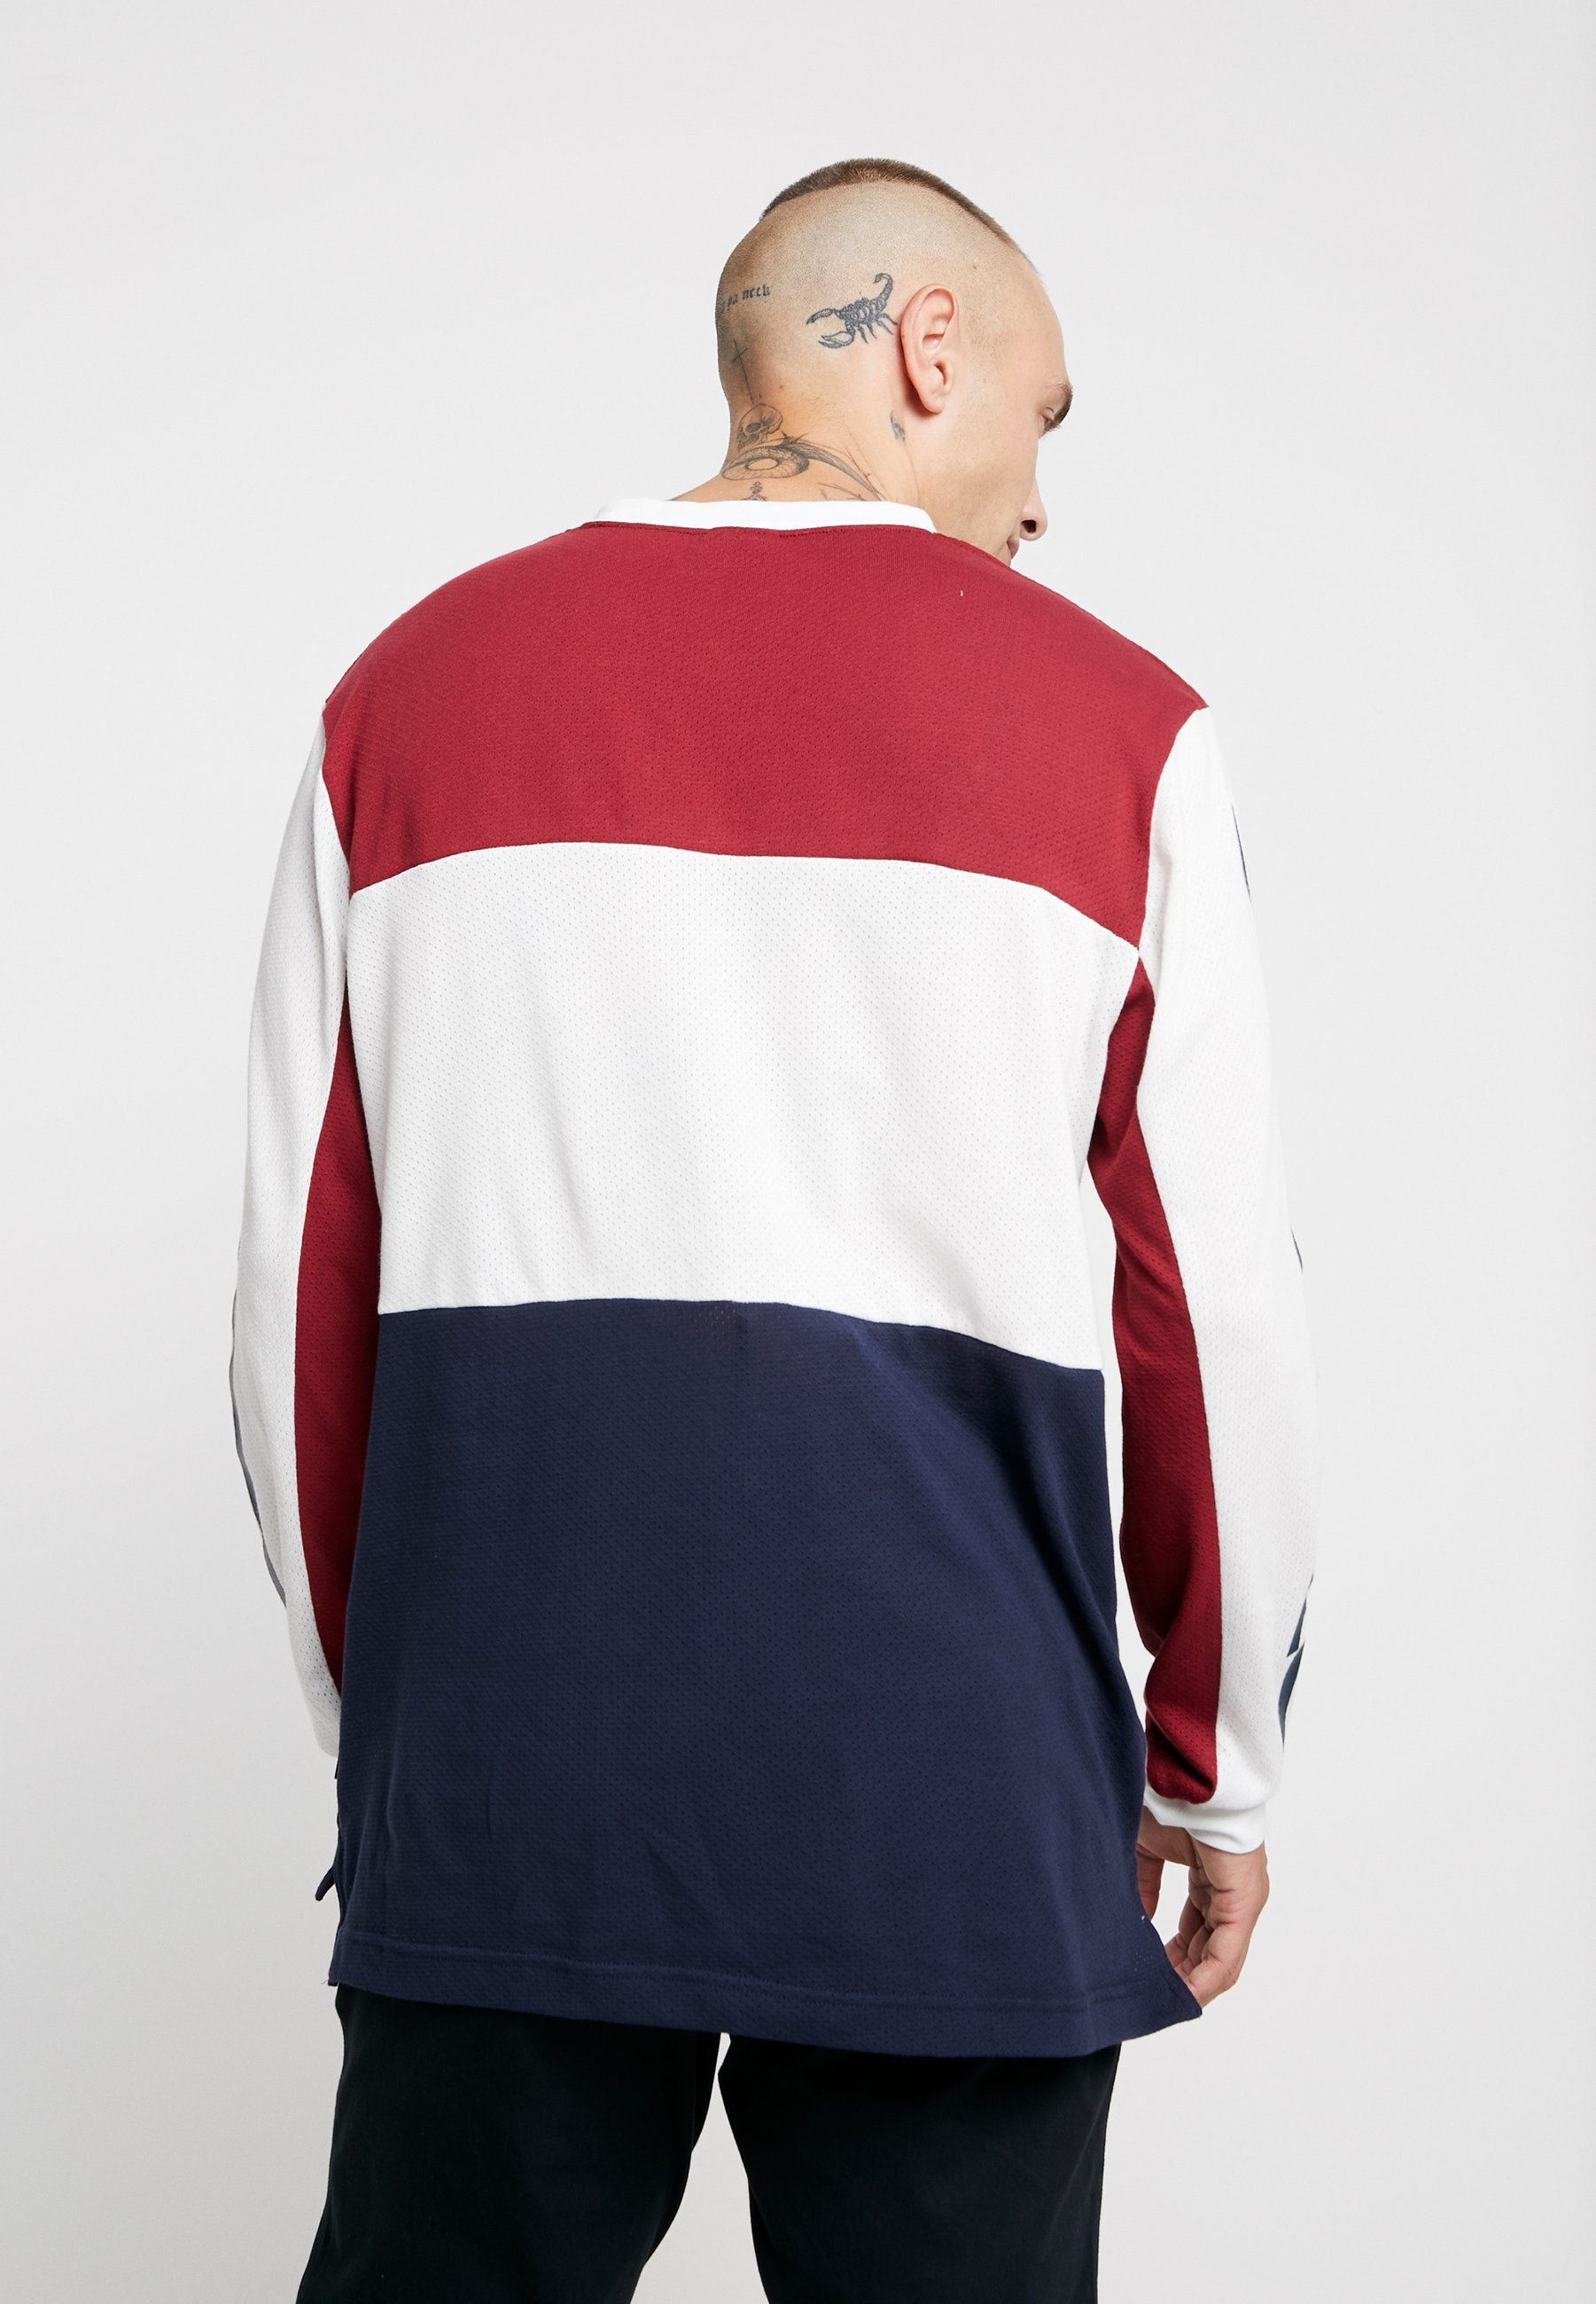 Sb Red T LonguesObsidian summit shirt À White Manches Nike team nOwkN8PX0